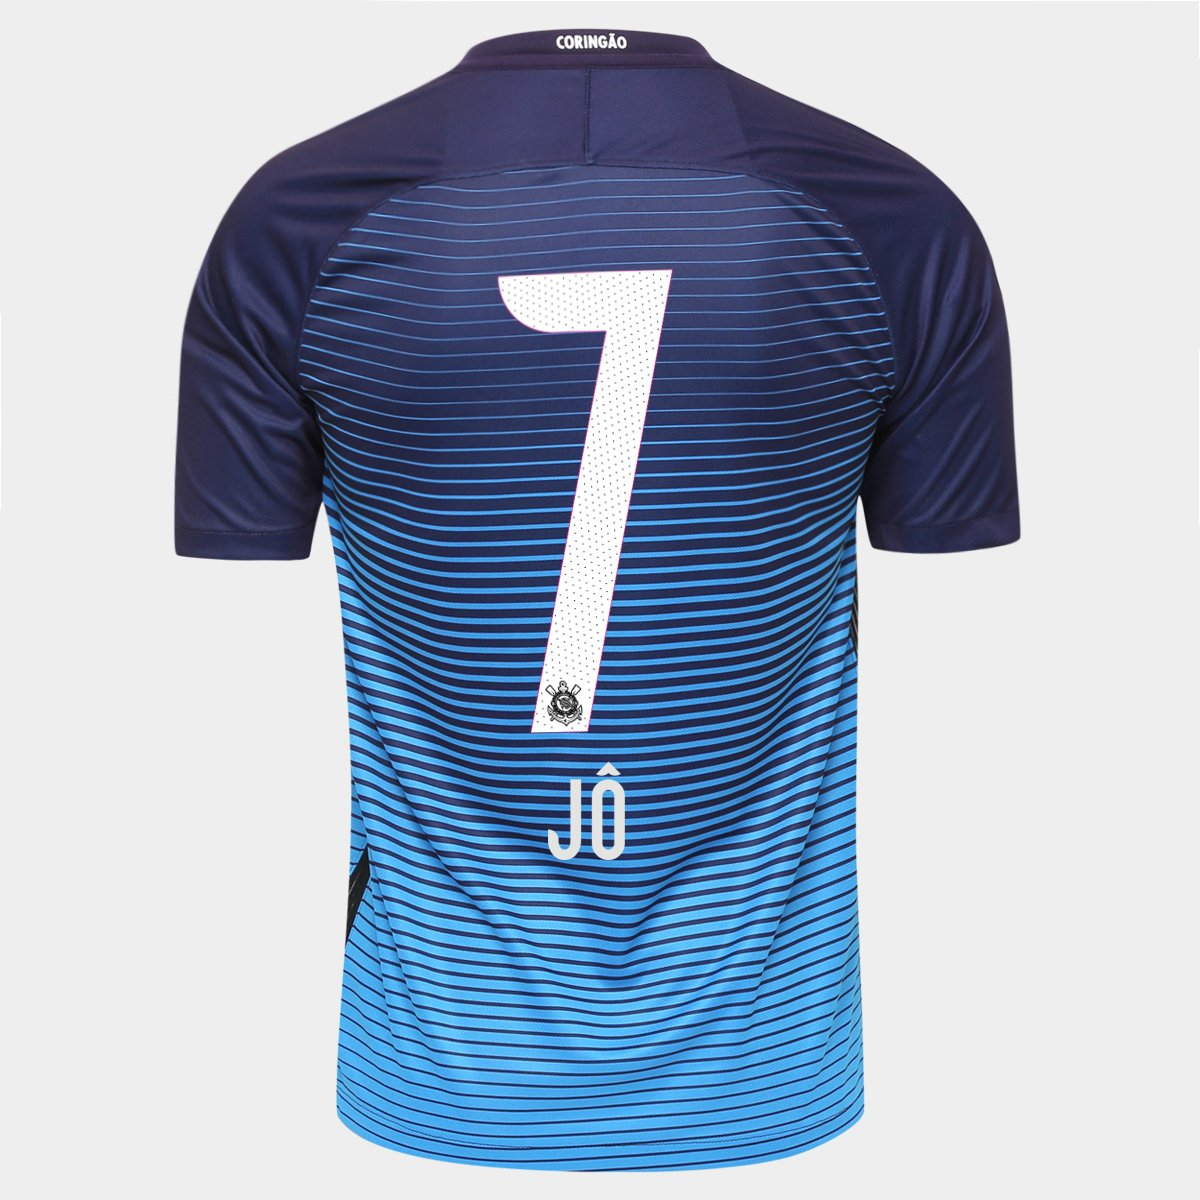 c61a281a66 Camisa Nike Corinthians III 2016 nº 7 - Jô - Compre Agora